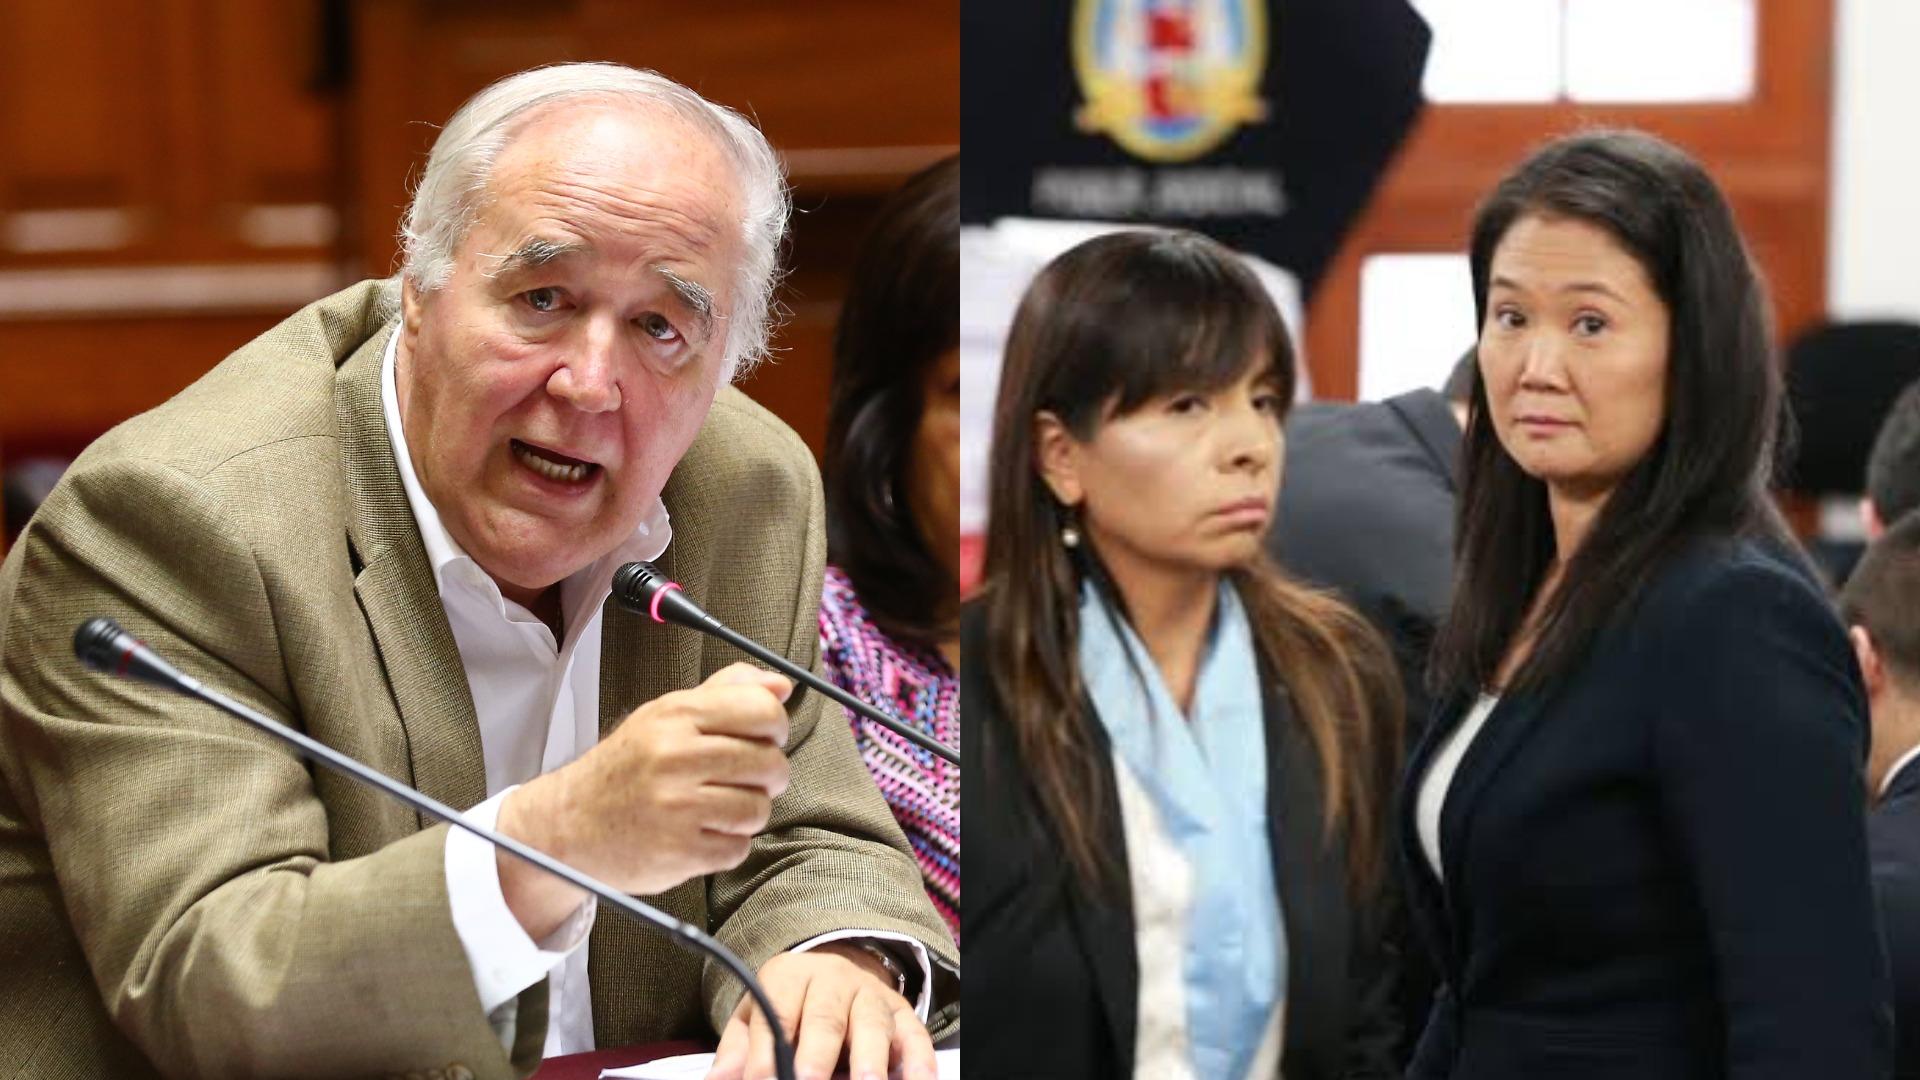 Víctor Andrés García Belaunde-Caso Keiko Fujimori